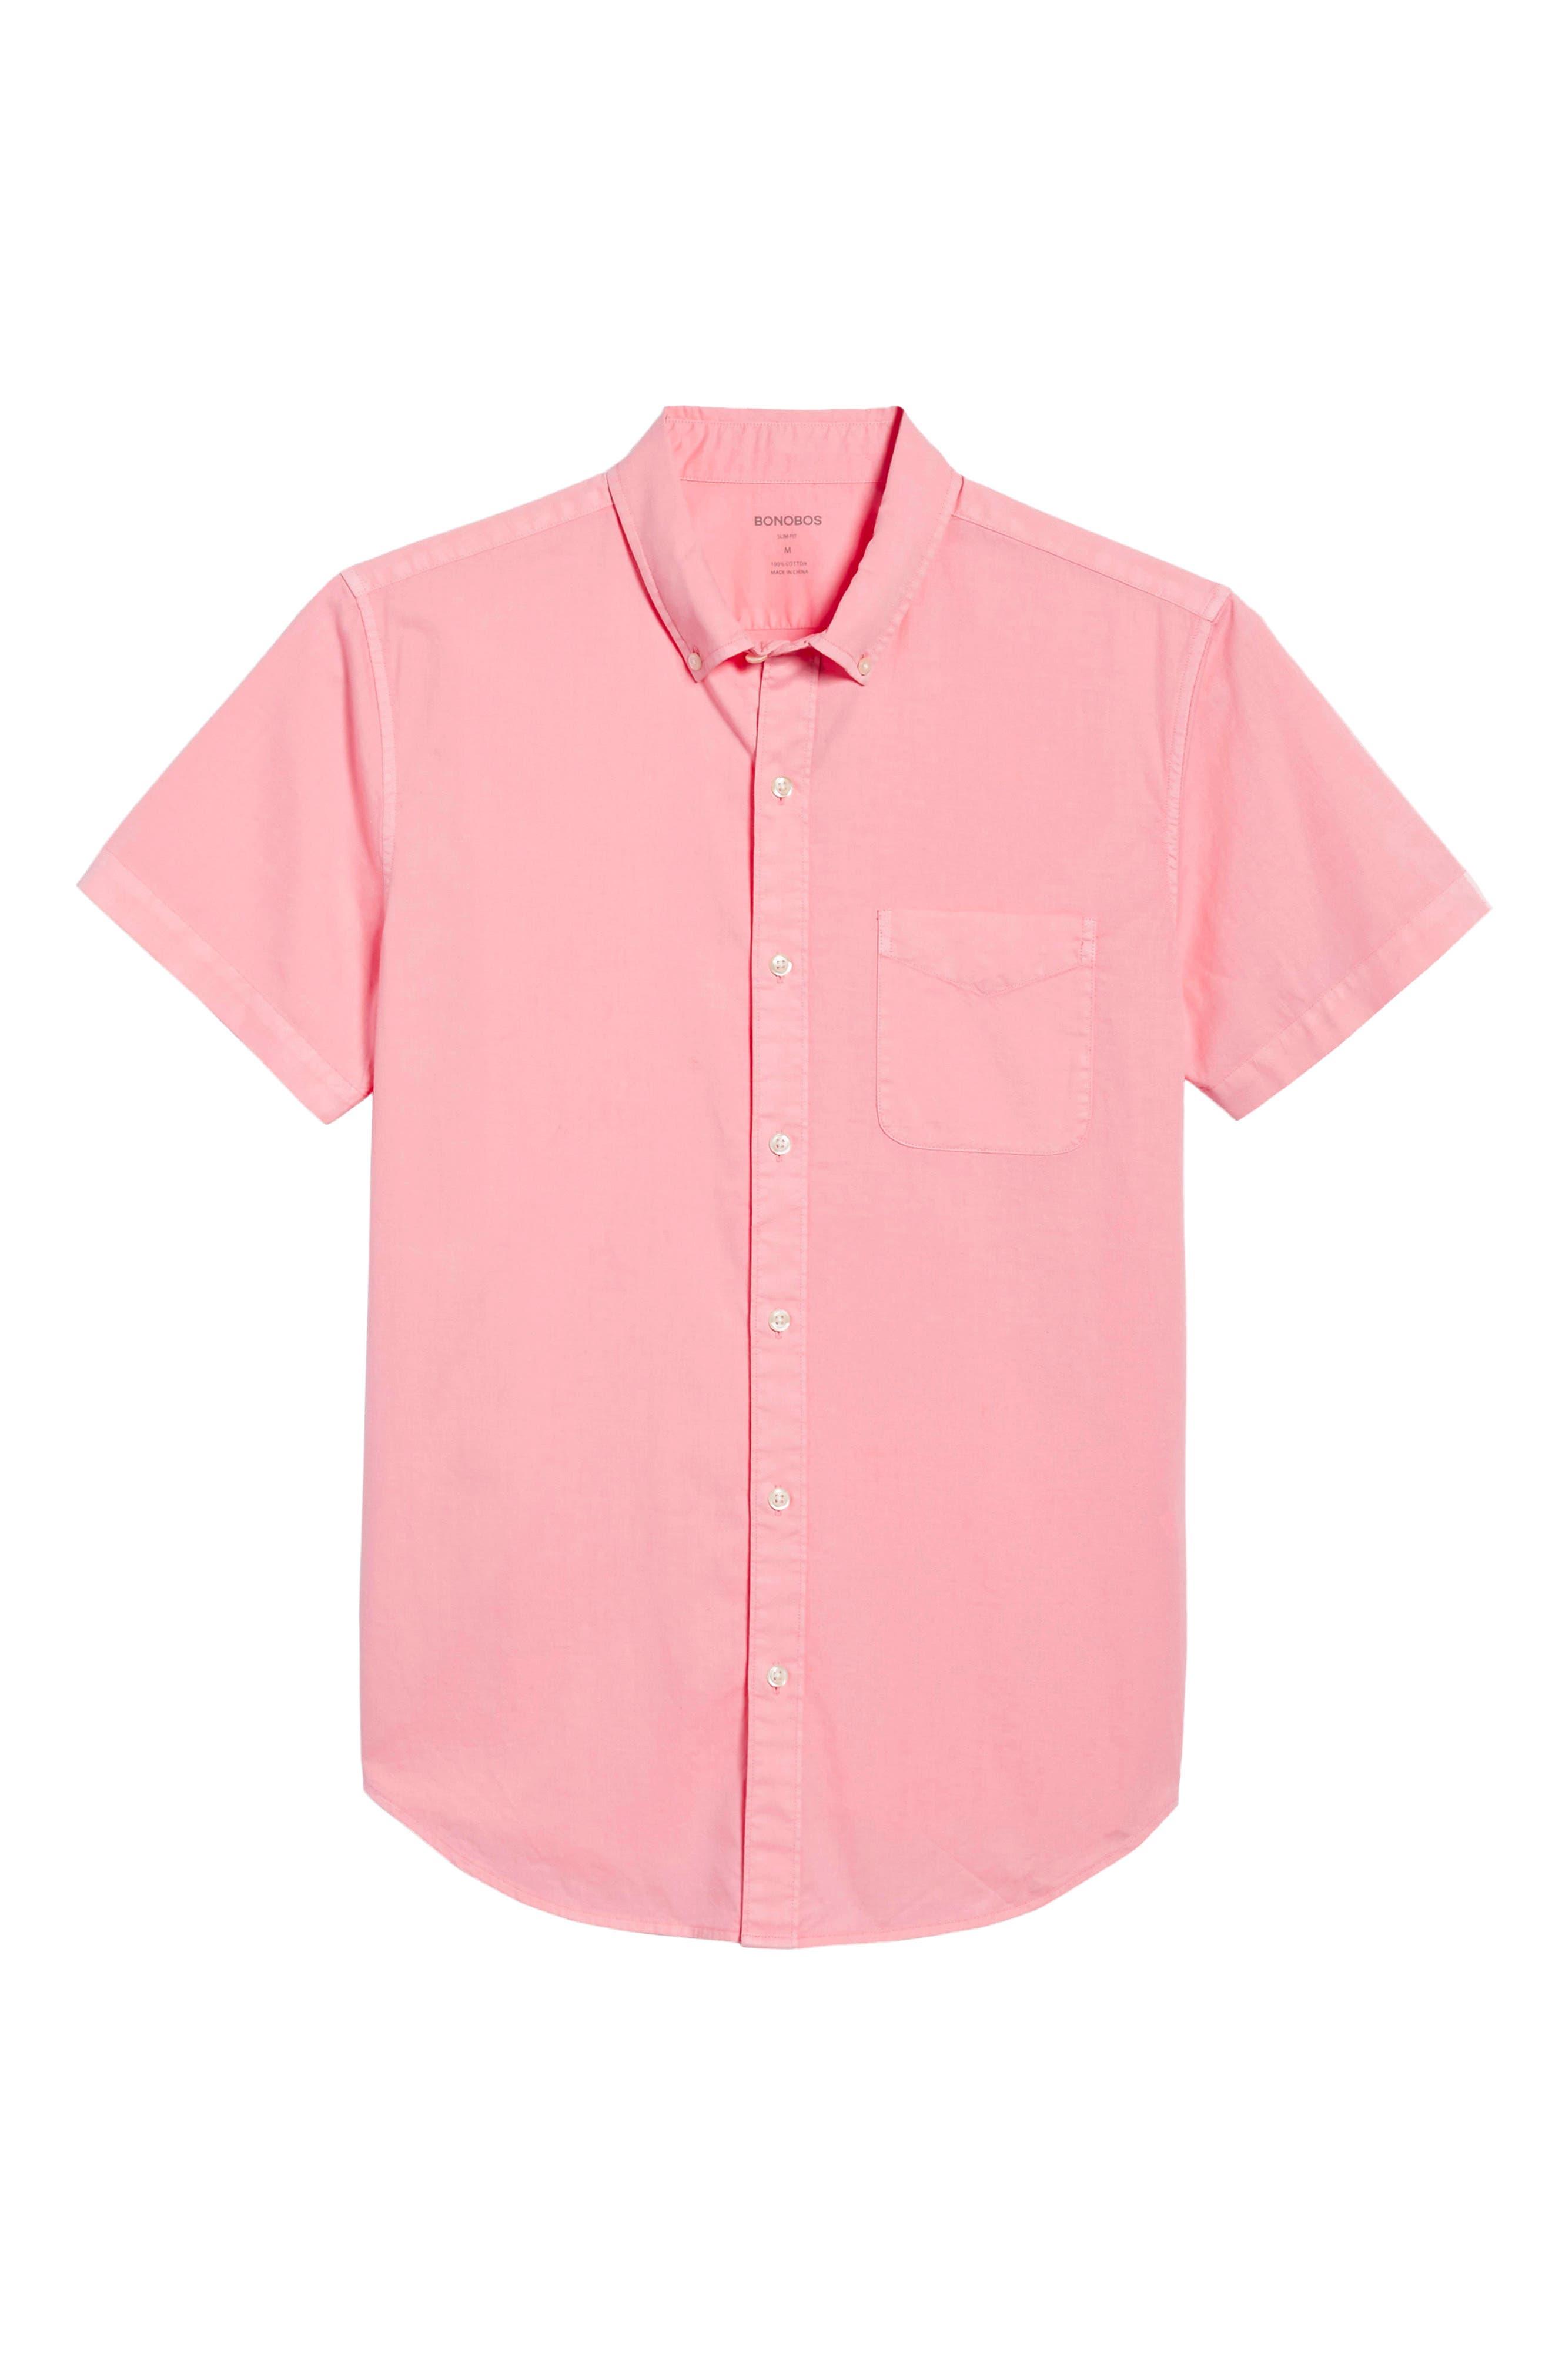 Slim Fit Short Sleeve Sport Shirt,                             Alternate thumbnail 6, color,                             Garment Dye - Pacific Pink